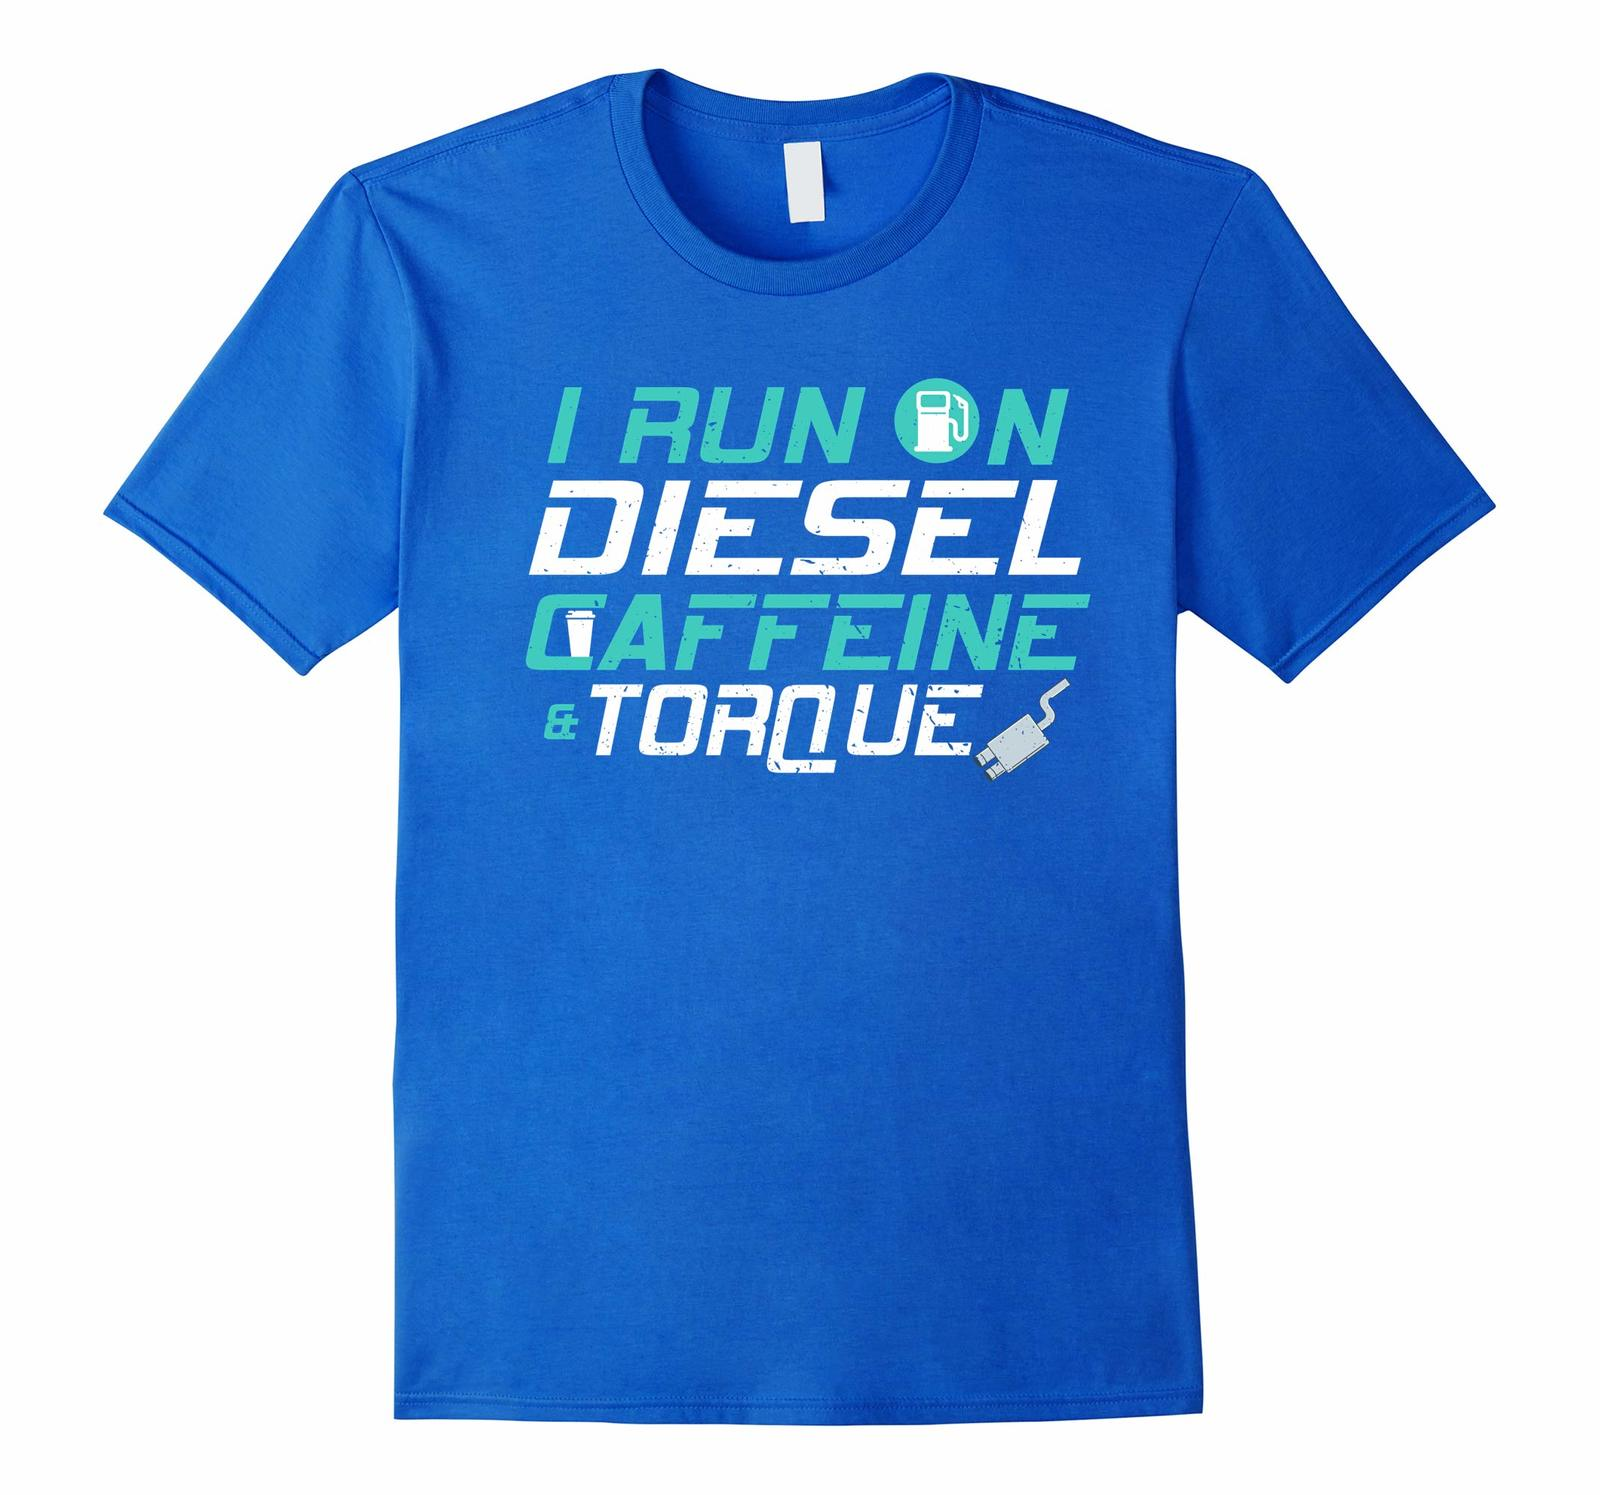 New Shirts - I Run On Diesel Caffeine Torque T-Shirt Funny Automobile Shirts Men